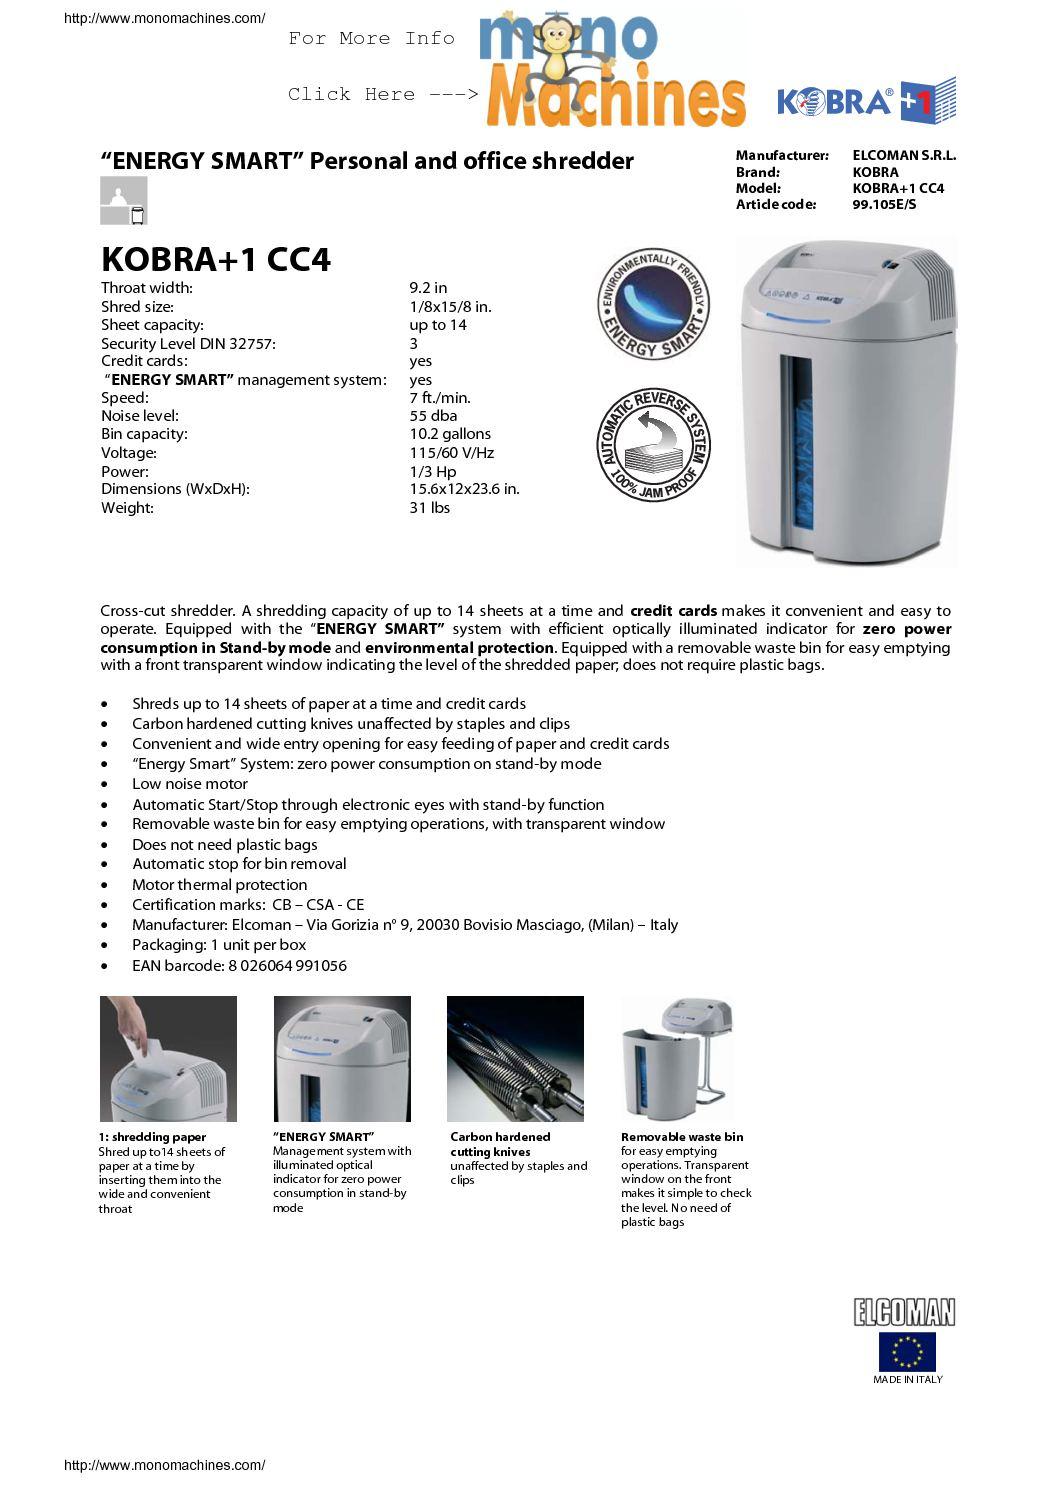 Calaméo - Kobra +1 CC4 Cross Cut Shredder Specs